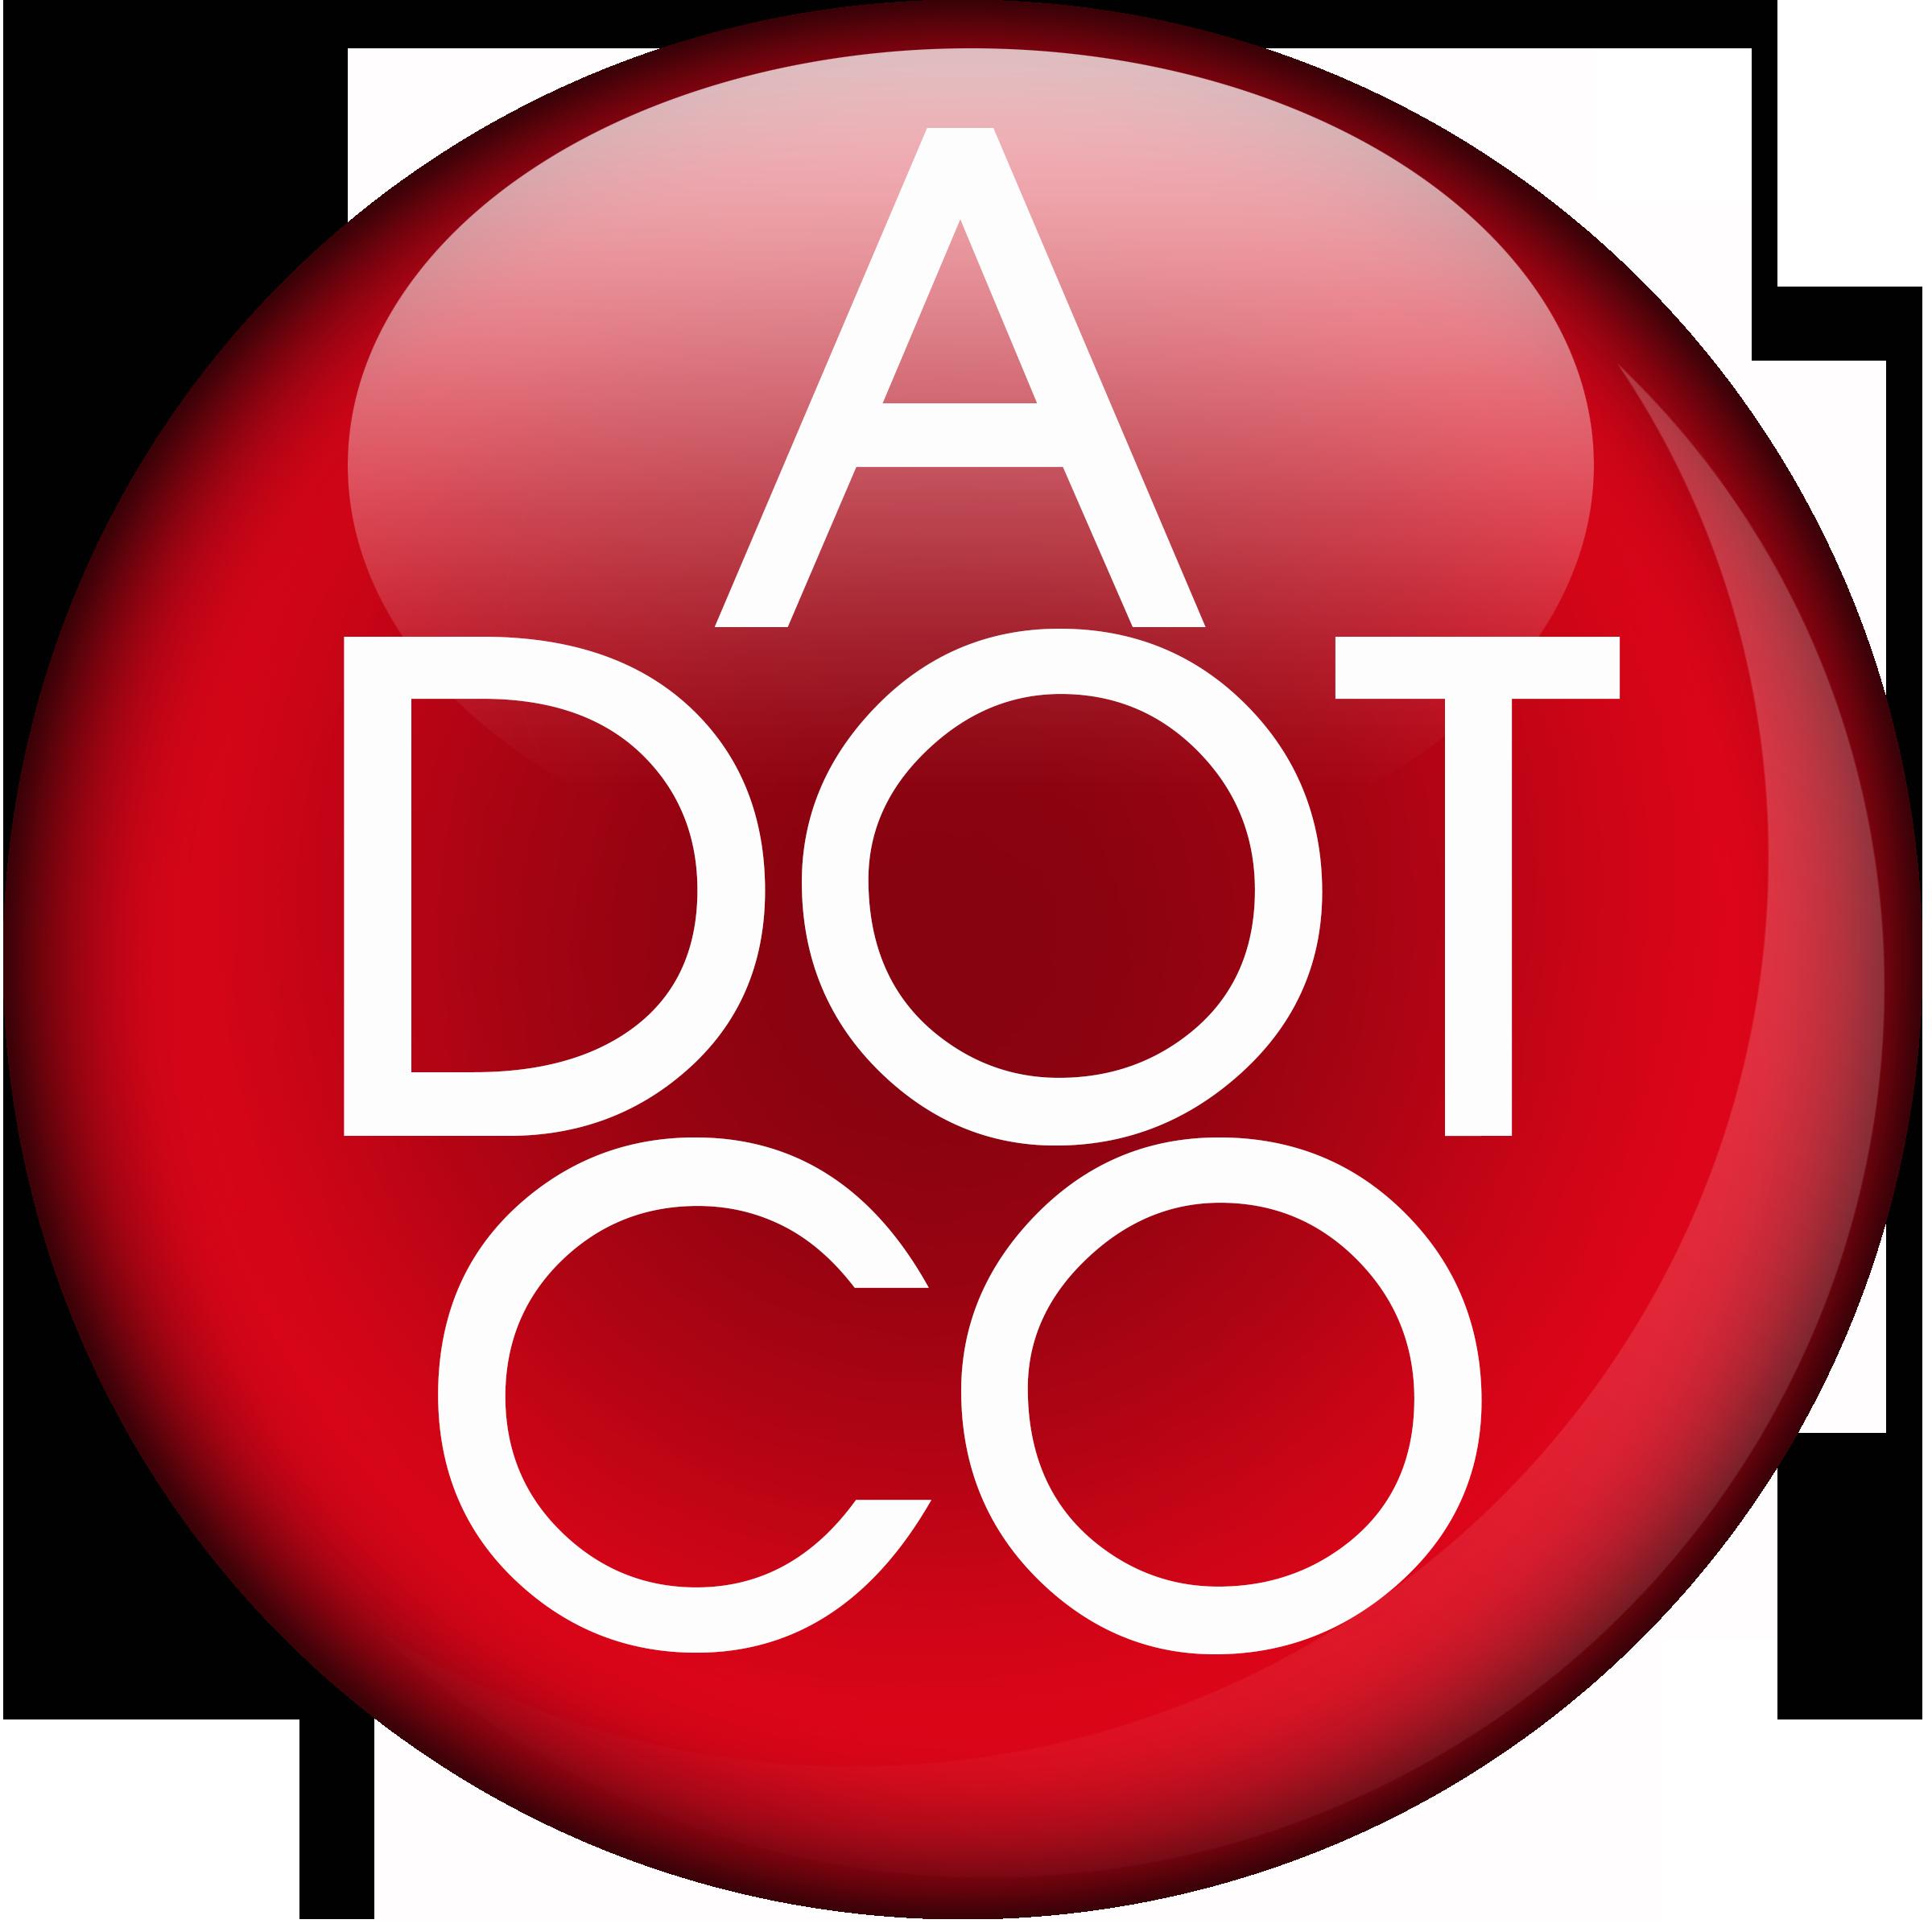 ADOTCO